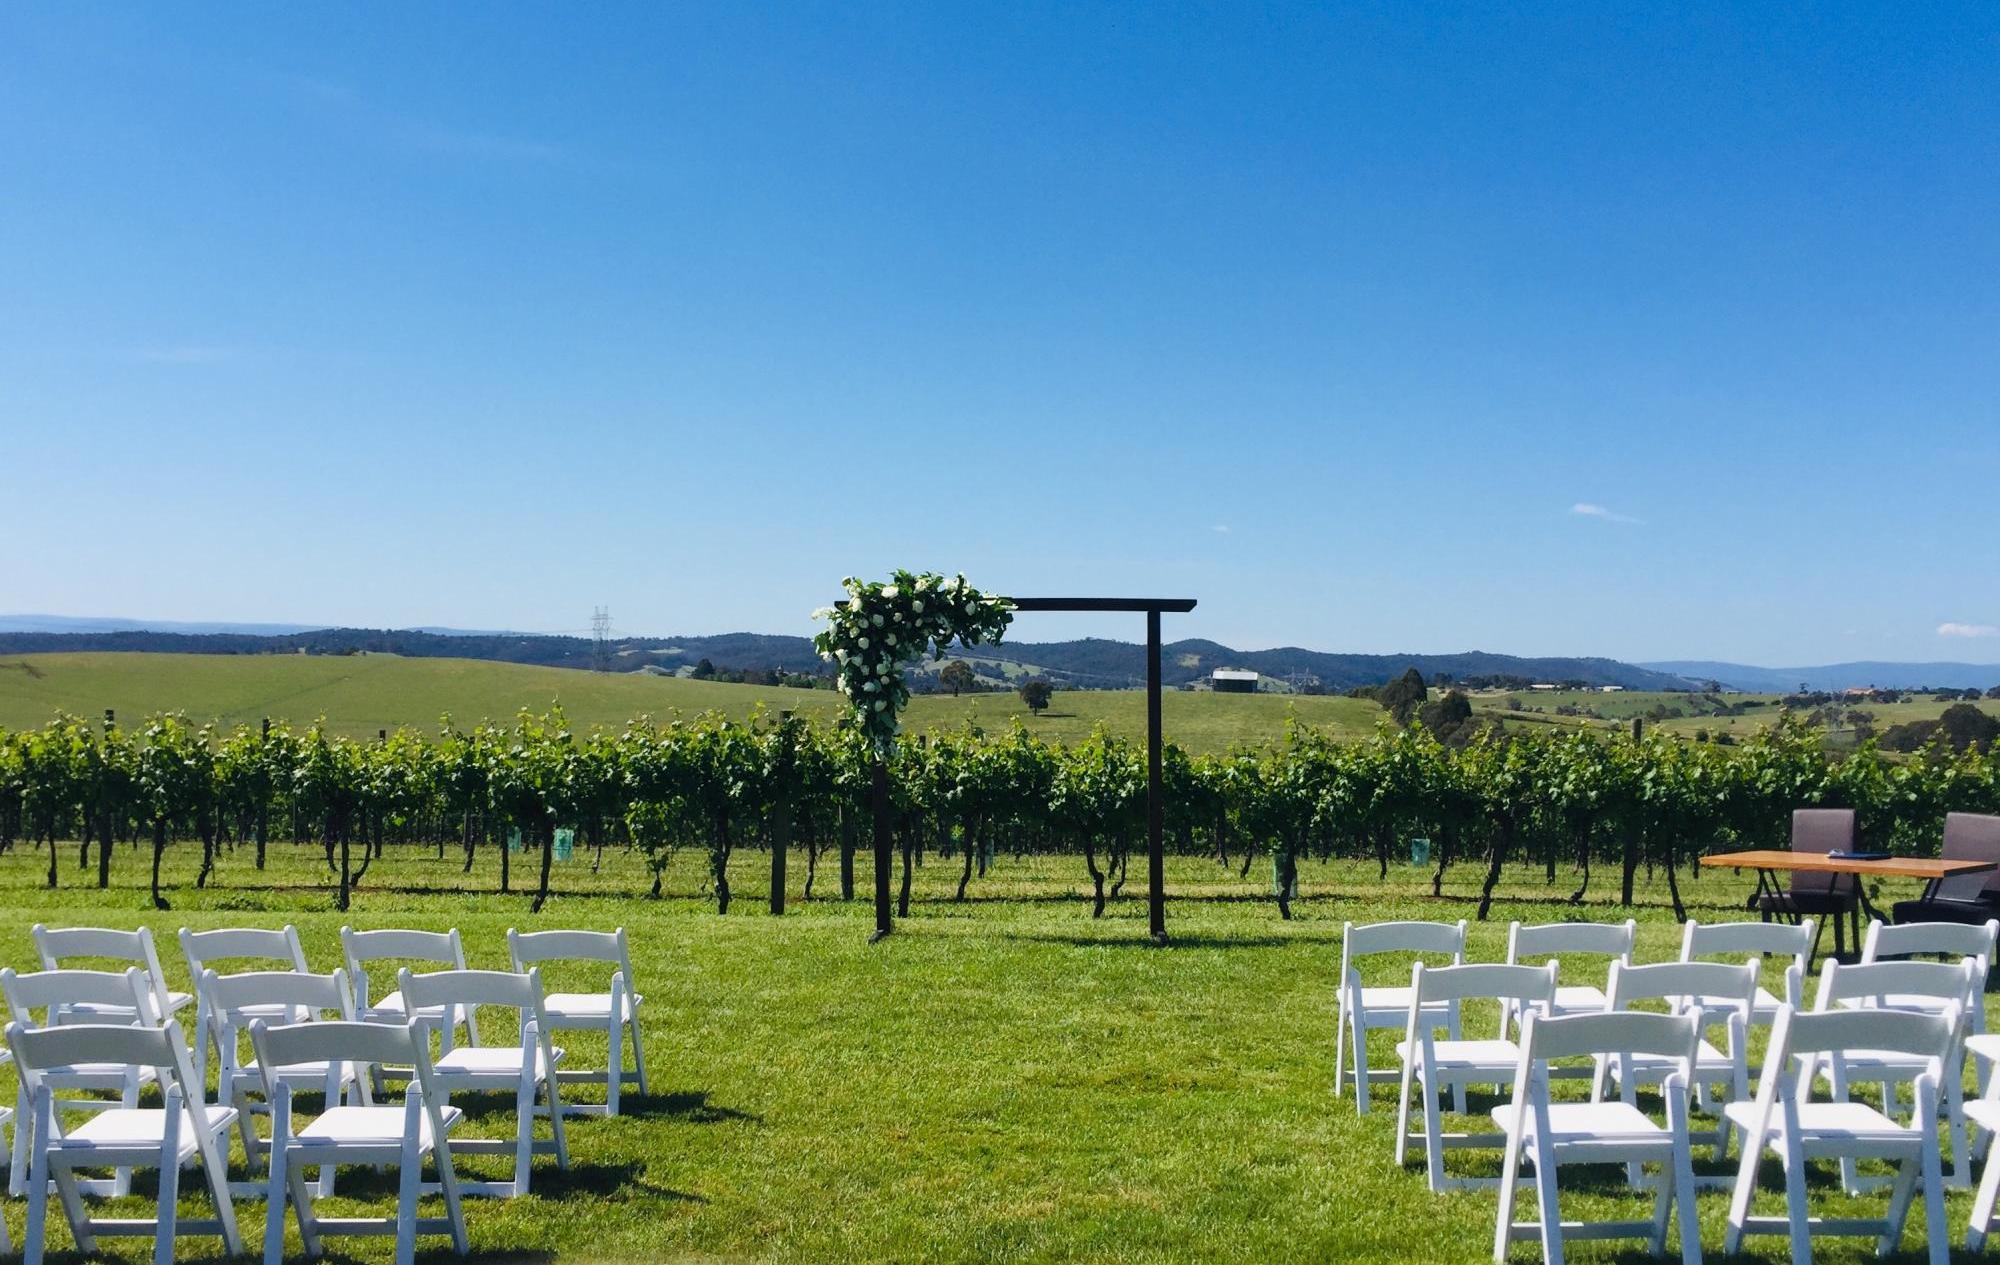 Vue on Halcyon outdoor wedding ceremony set up